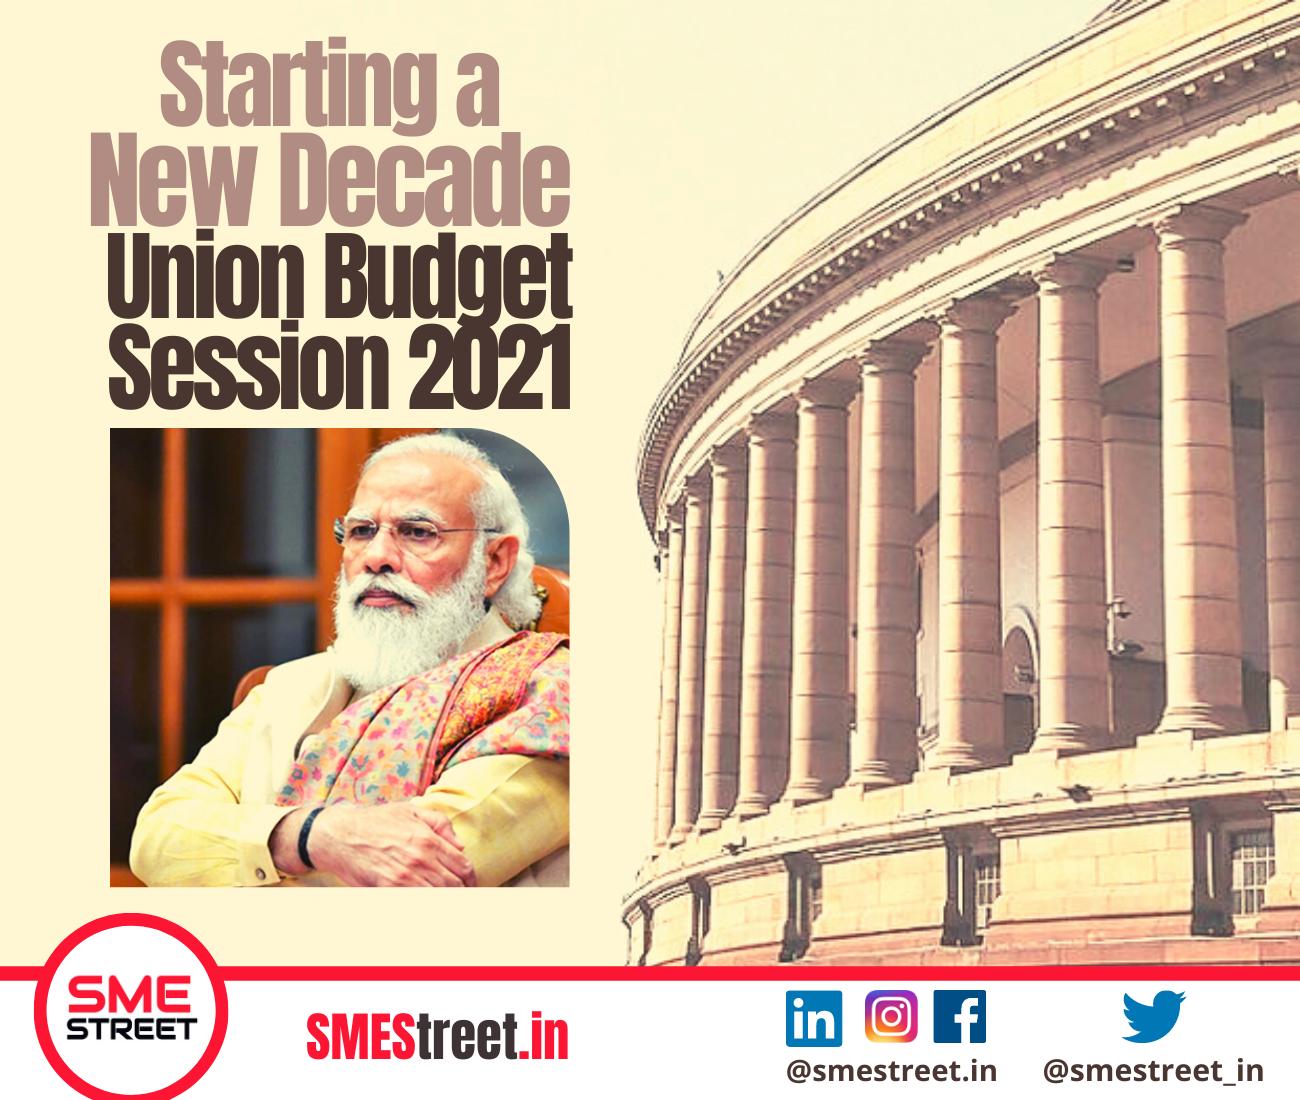 SMEStreet, Narendra Modi, Indian Parliament, Budget Session 2021, Budget 2021